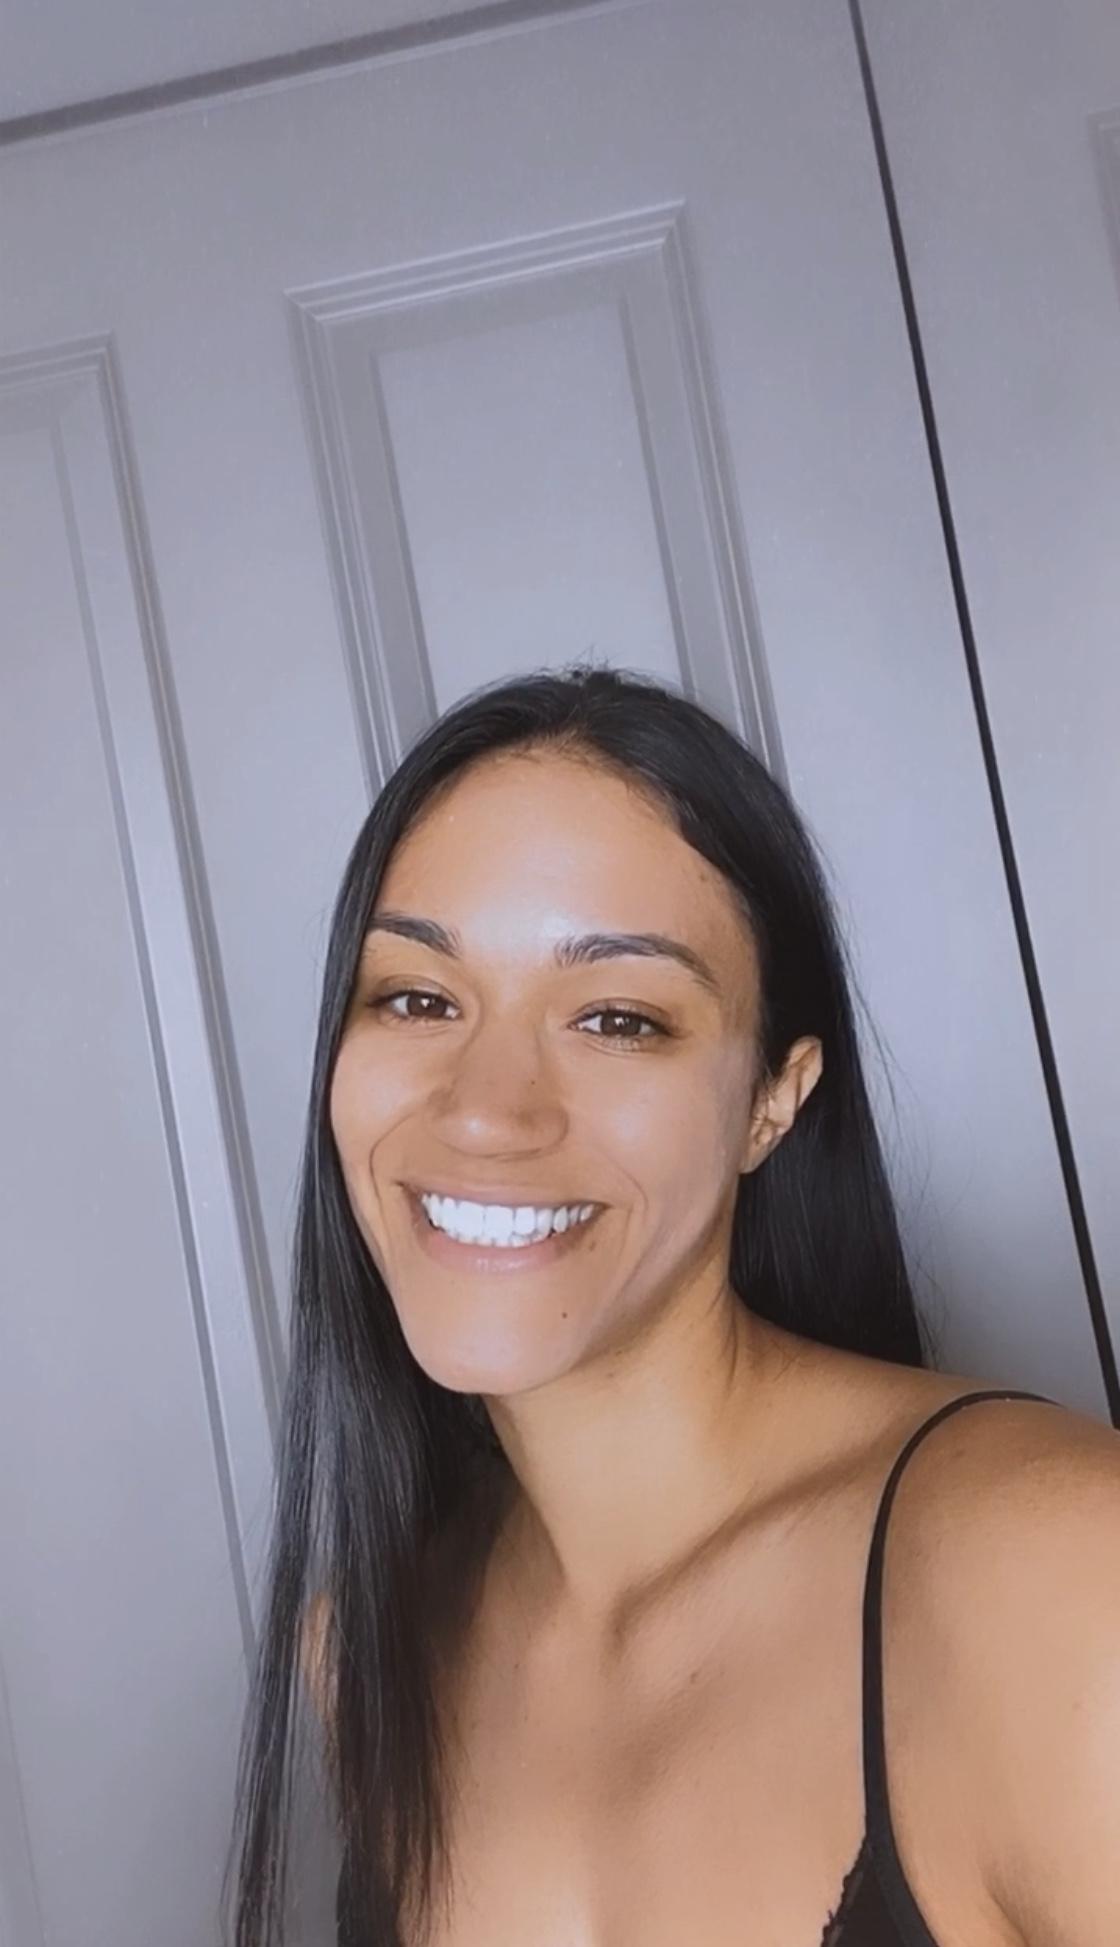 @vanessaburden profile image